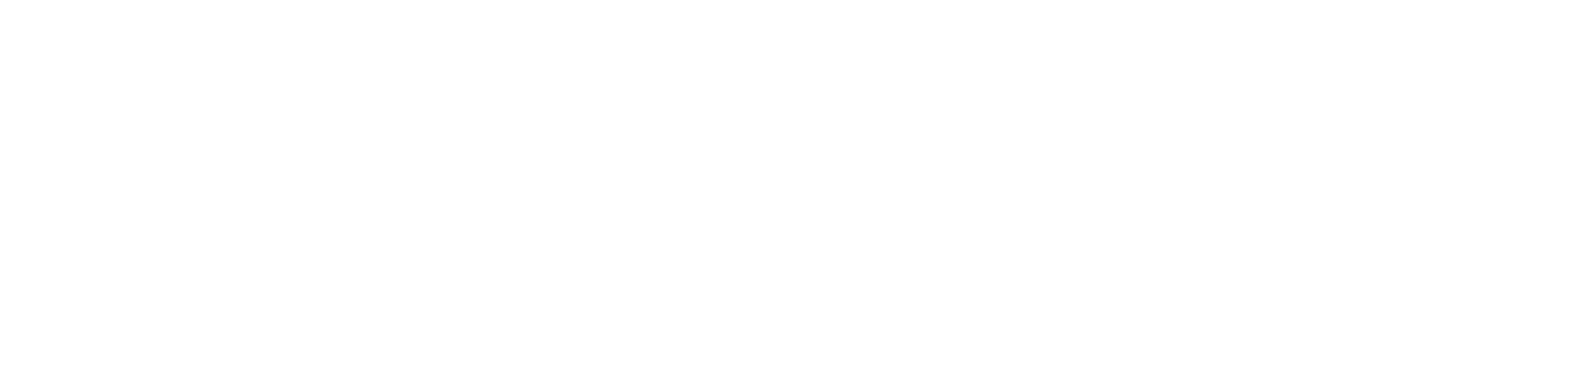 Aalto University Executive Education